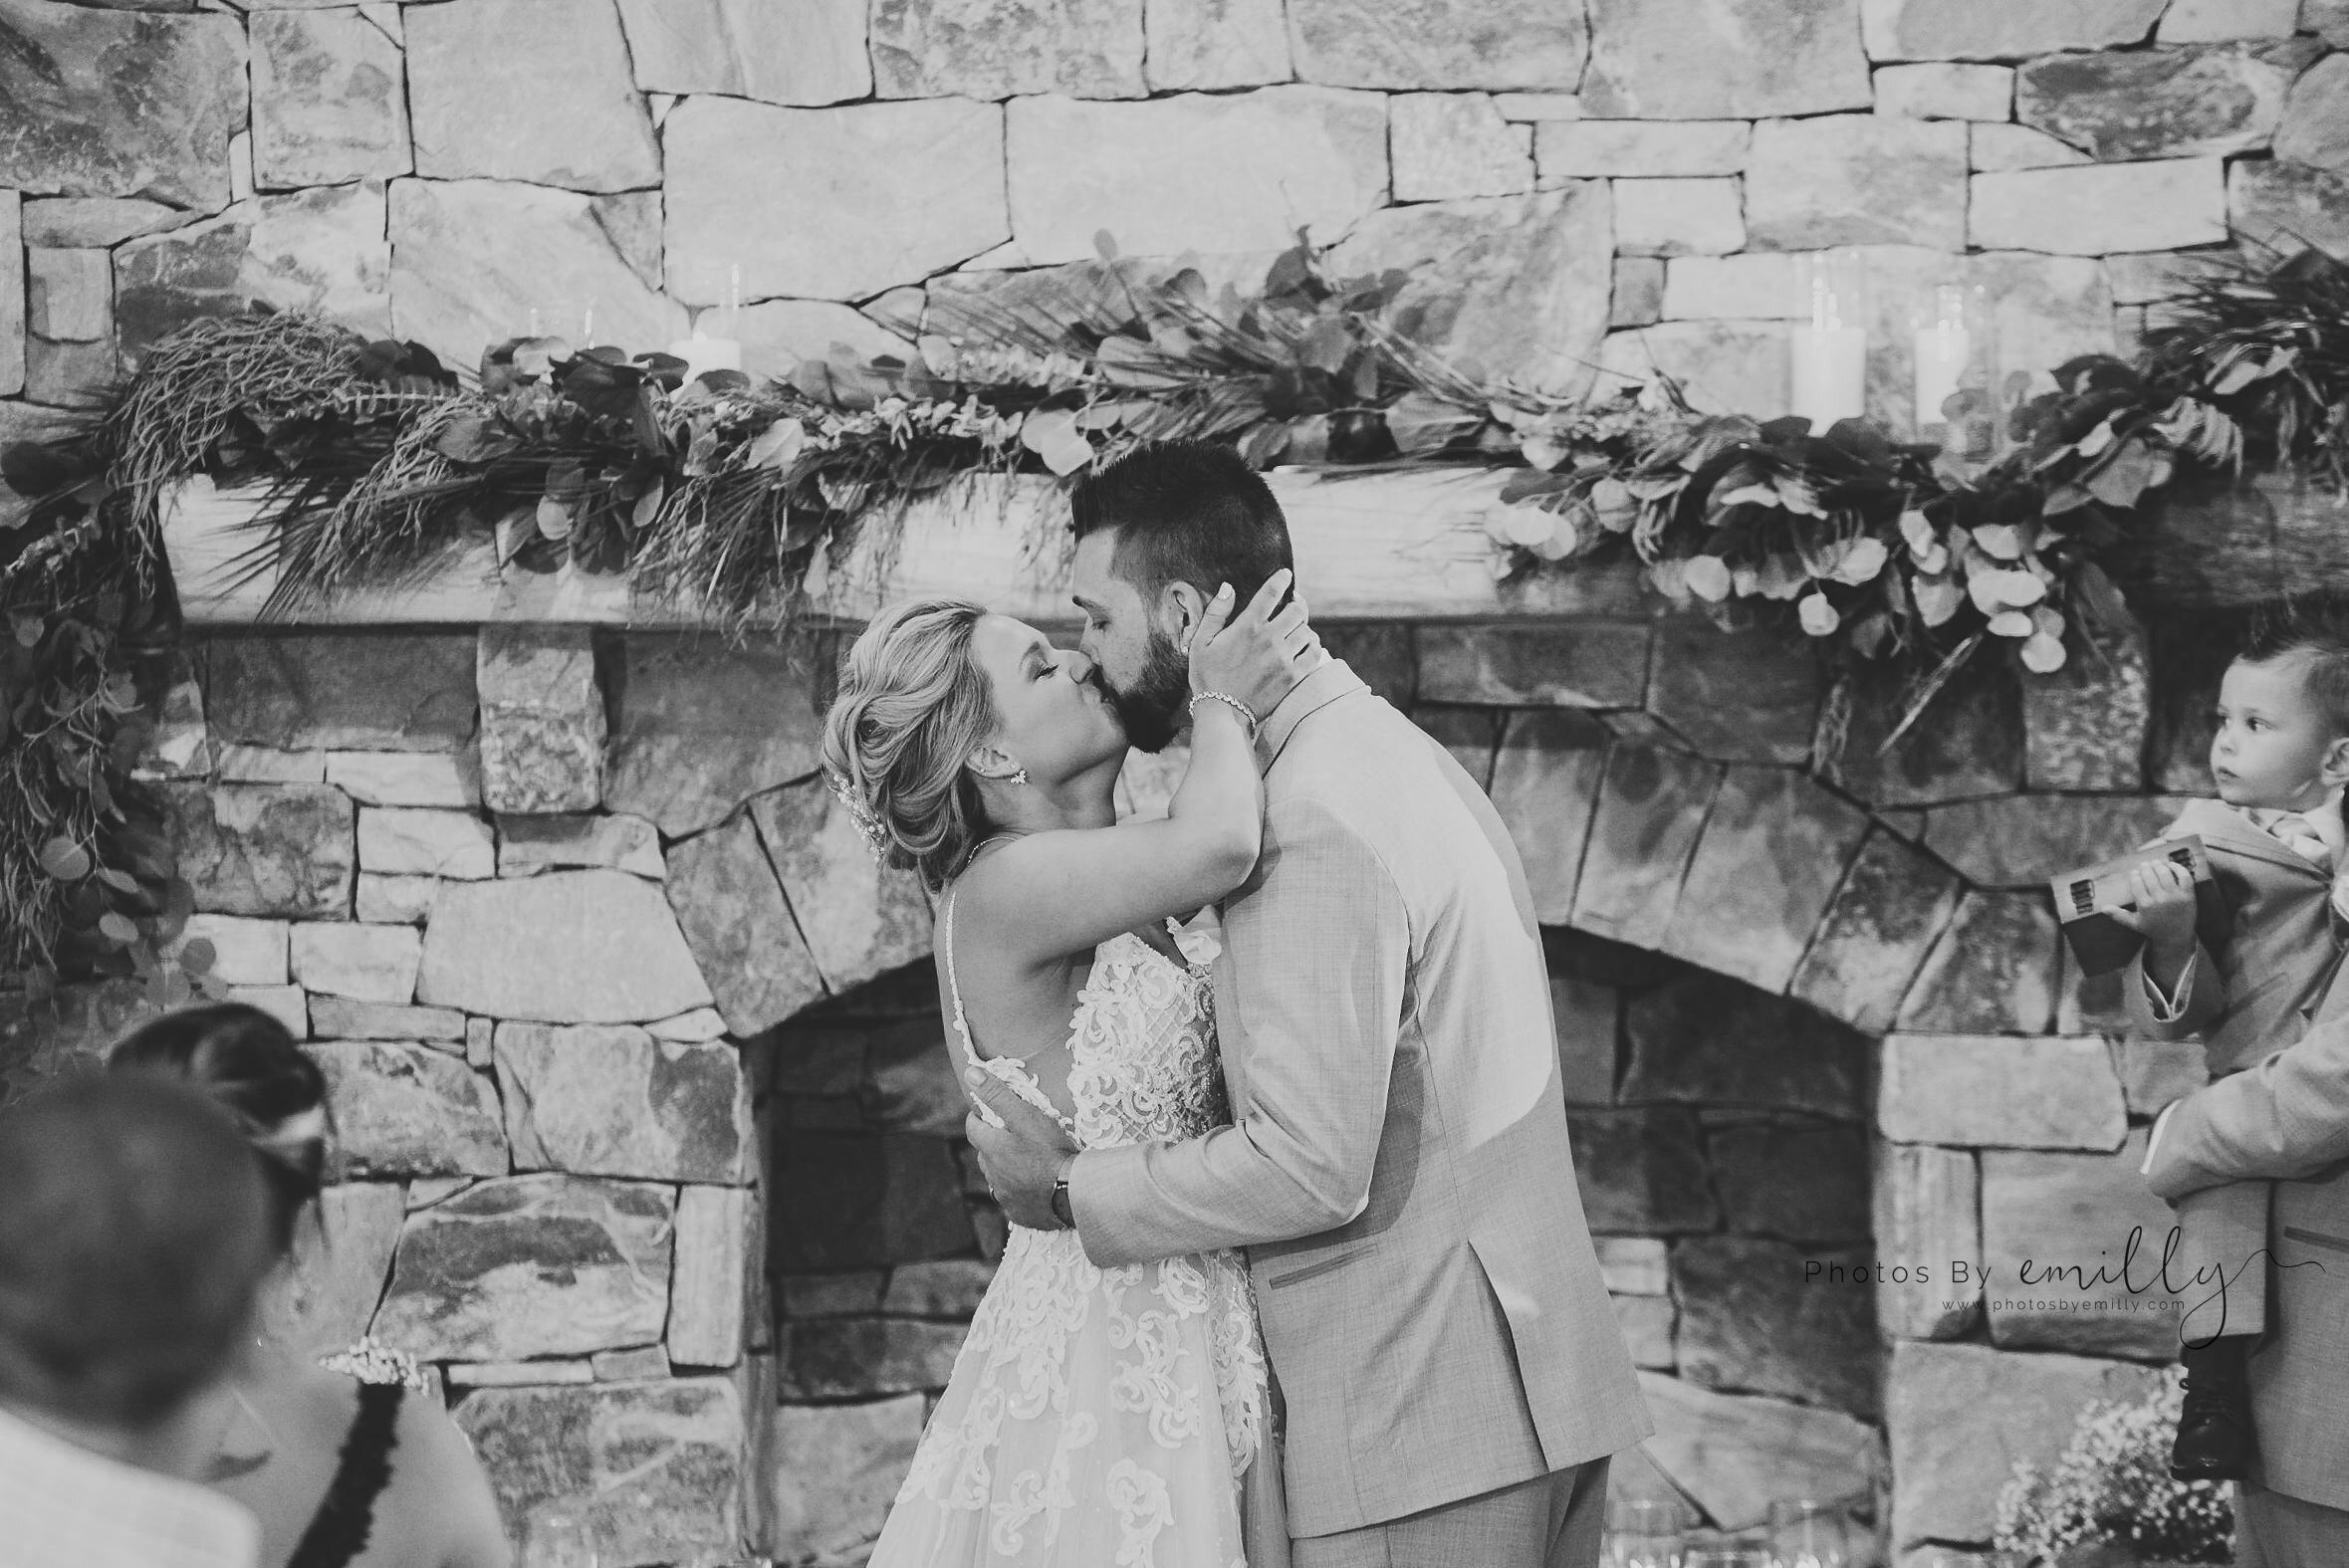 Photos by Emilly - LONG Wedding (16).jpg